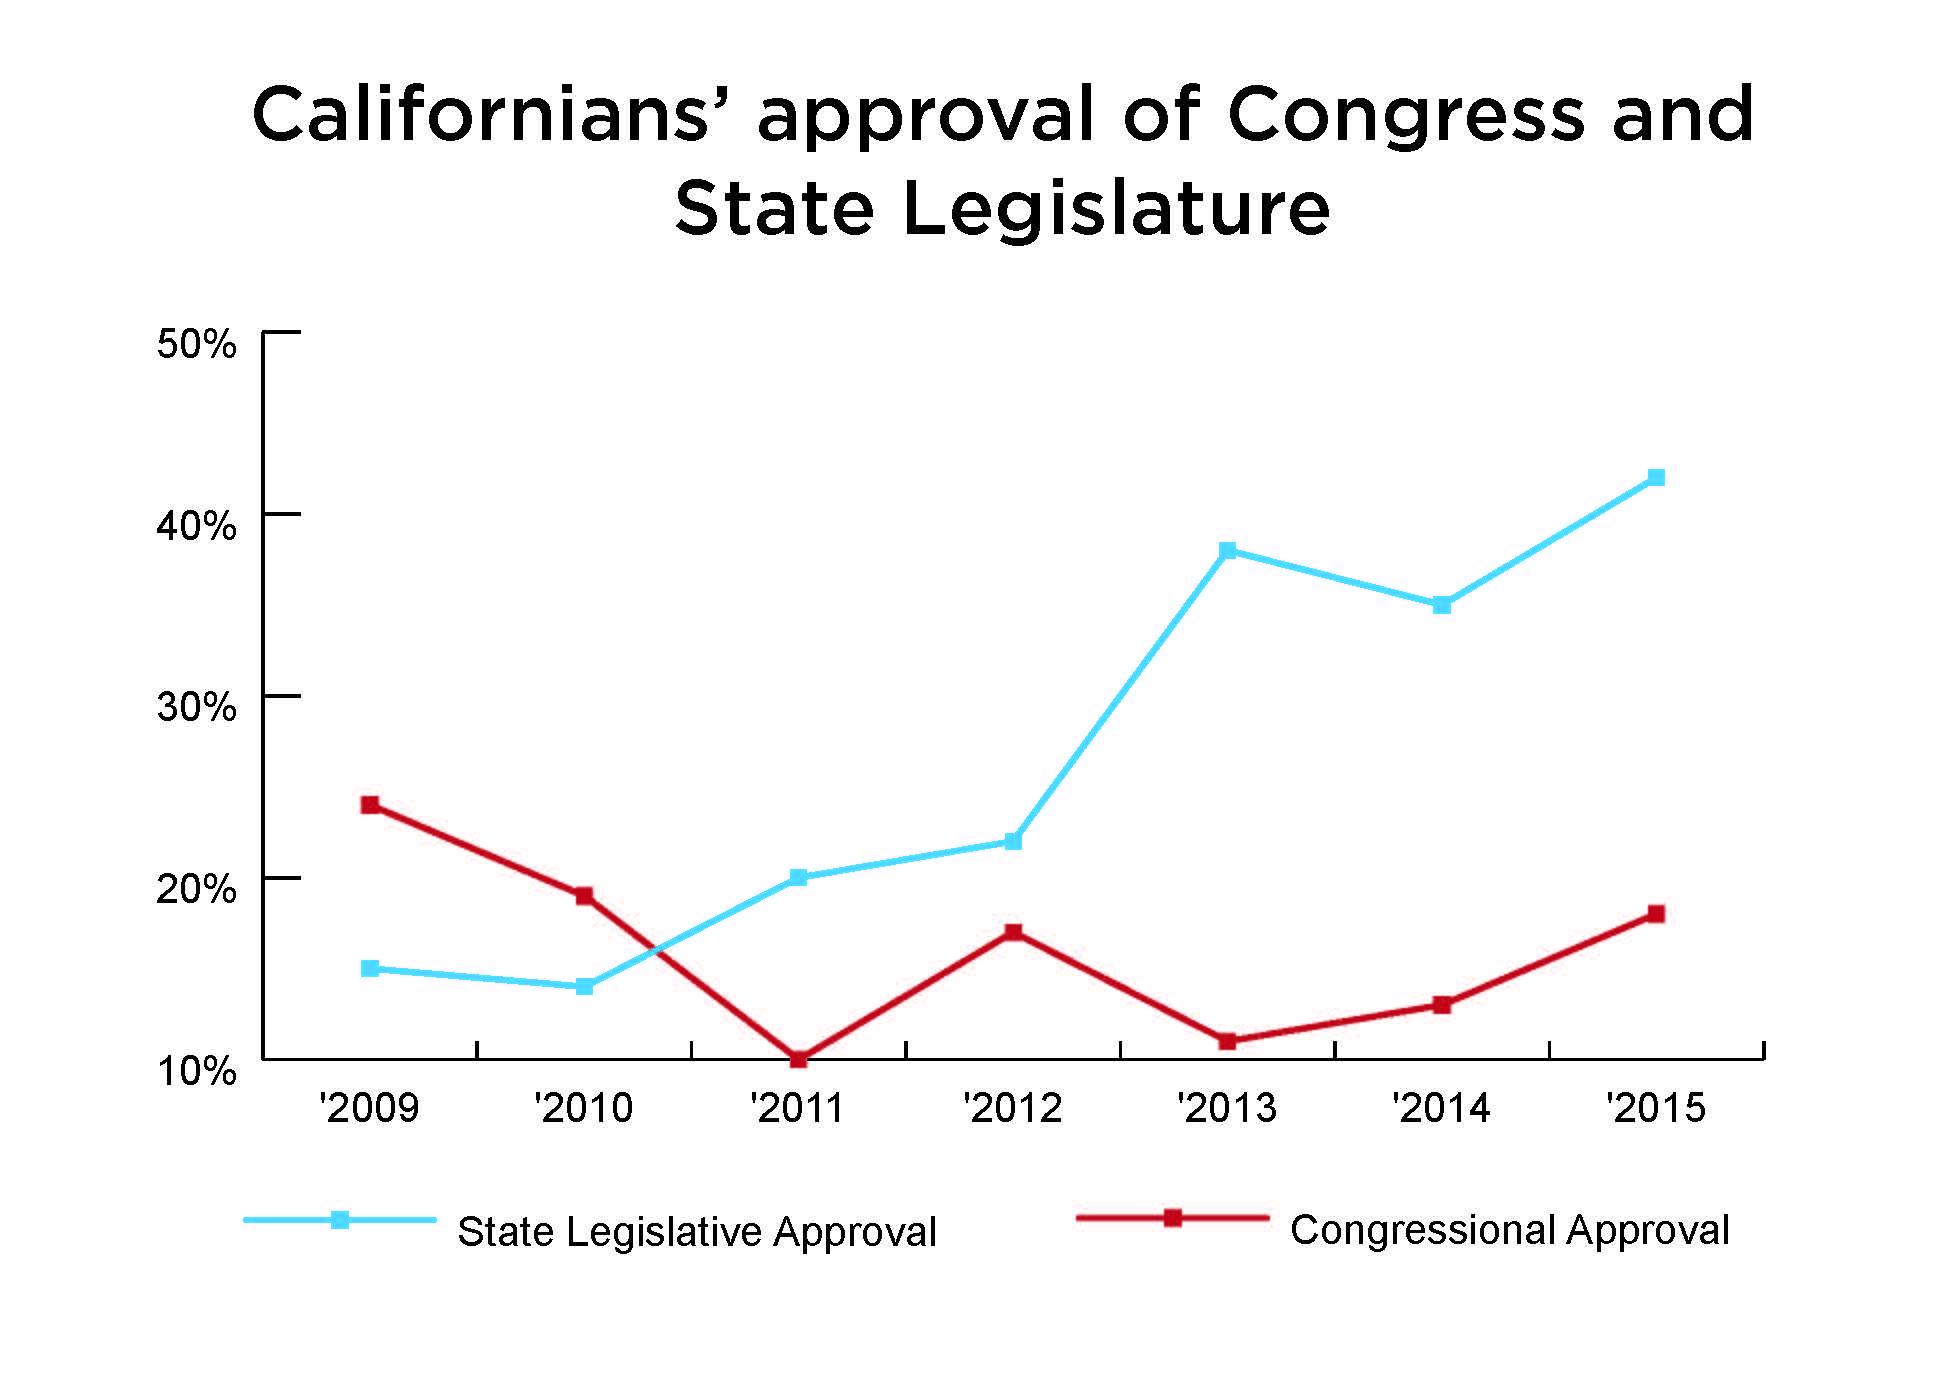 CongressApproval.jpg